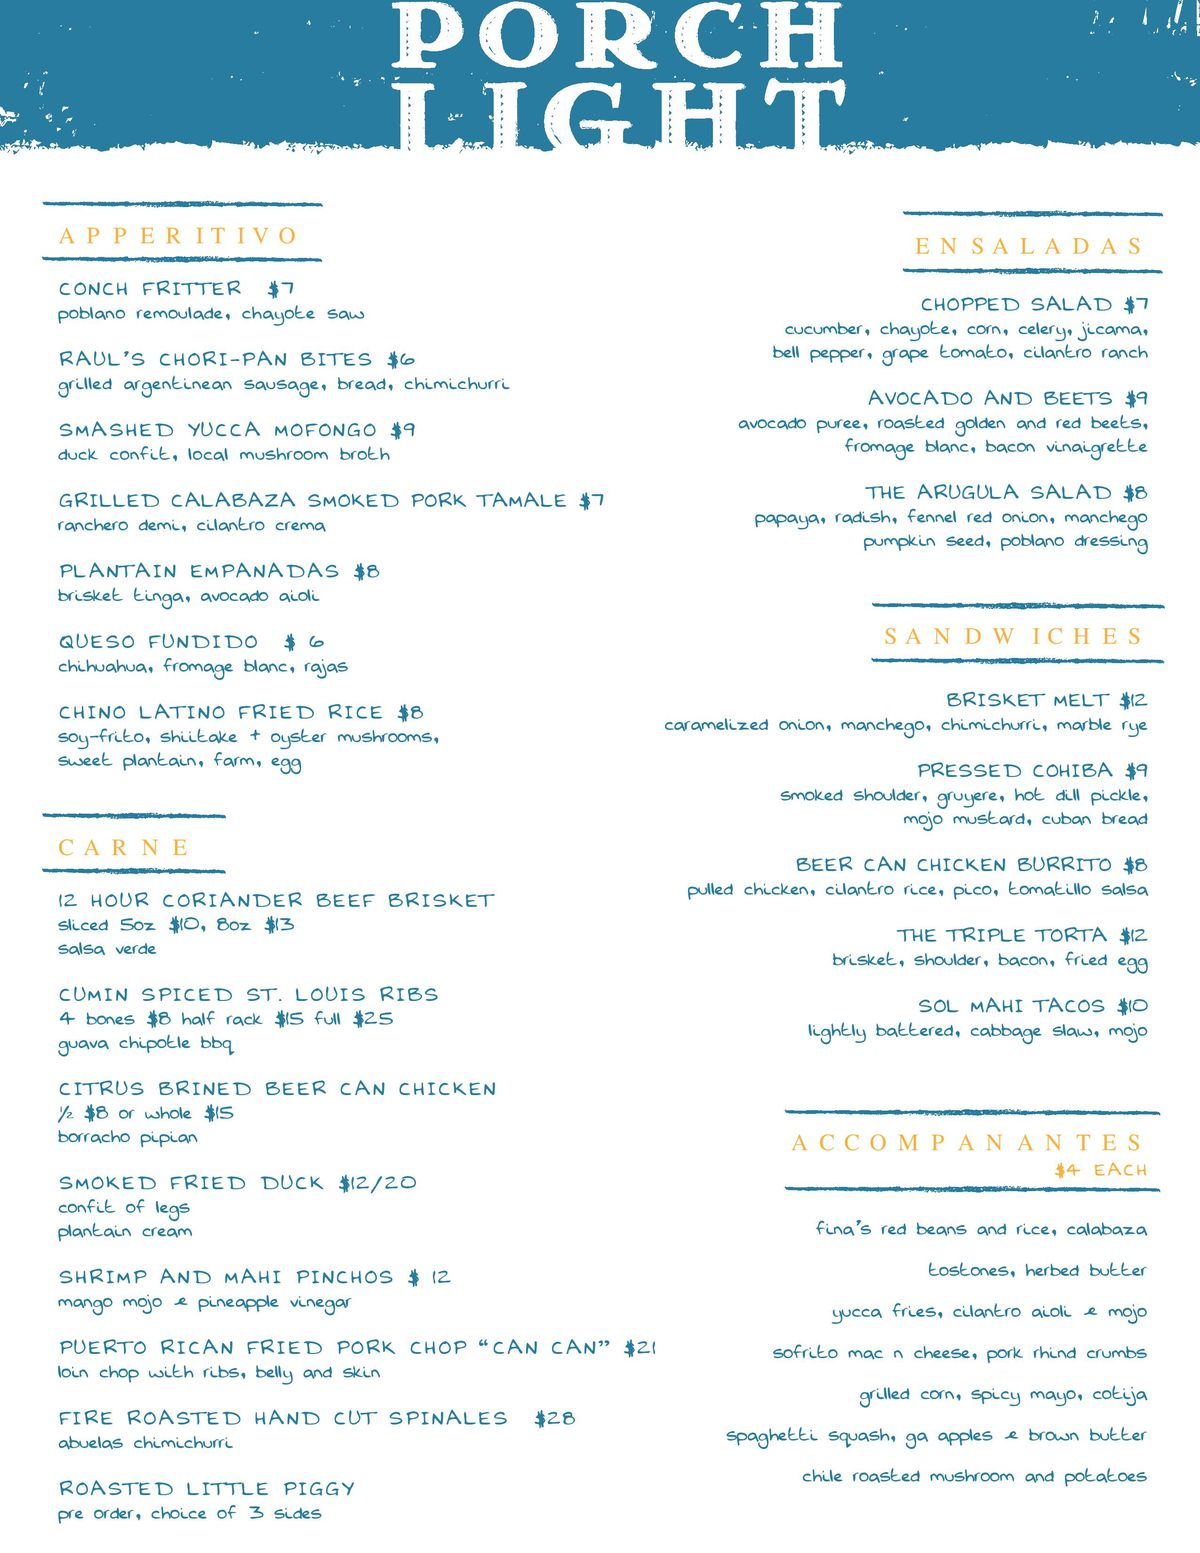 Porch Light Kitchen menu